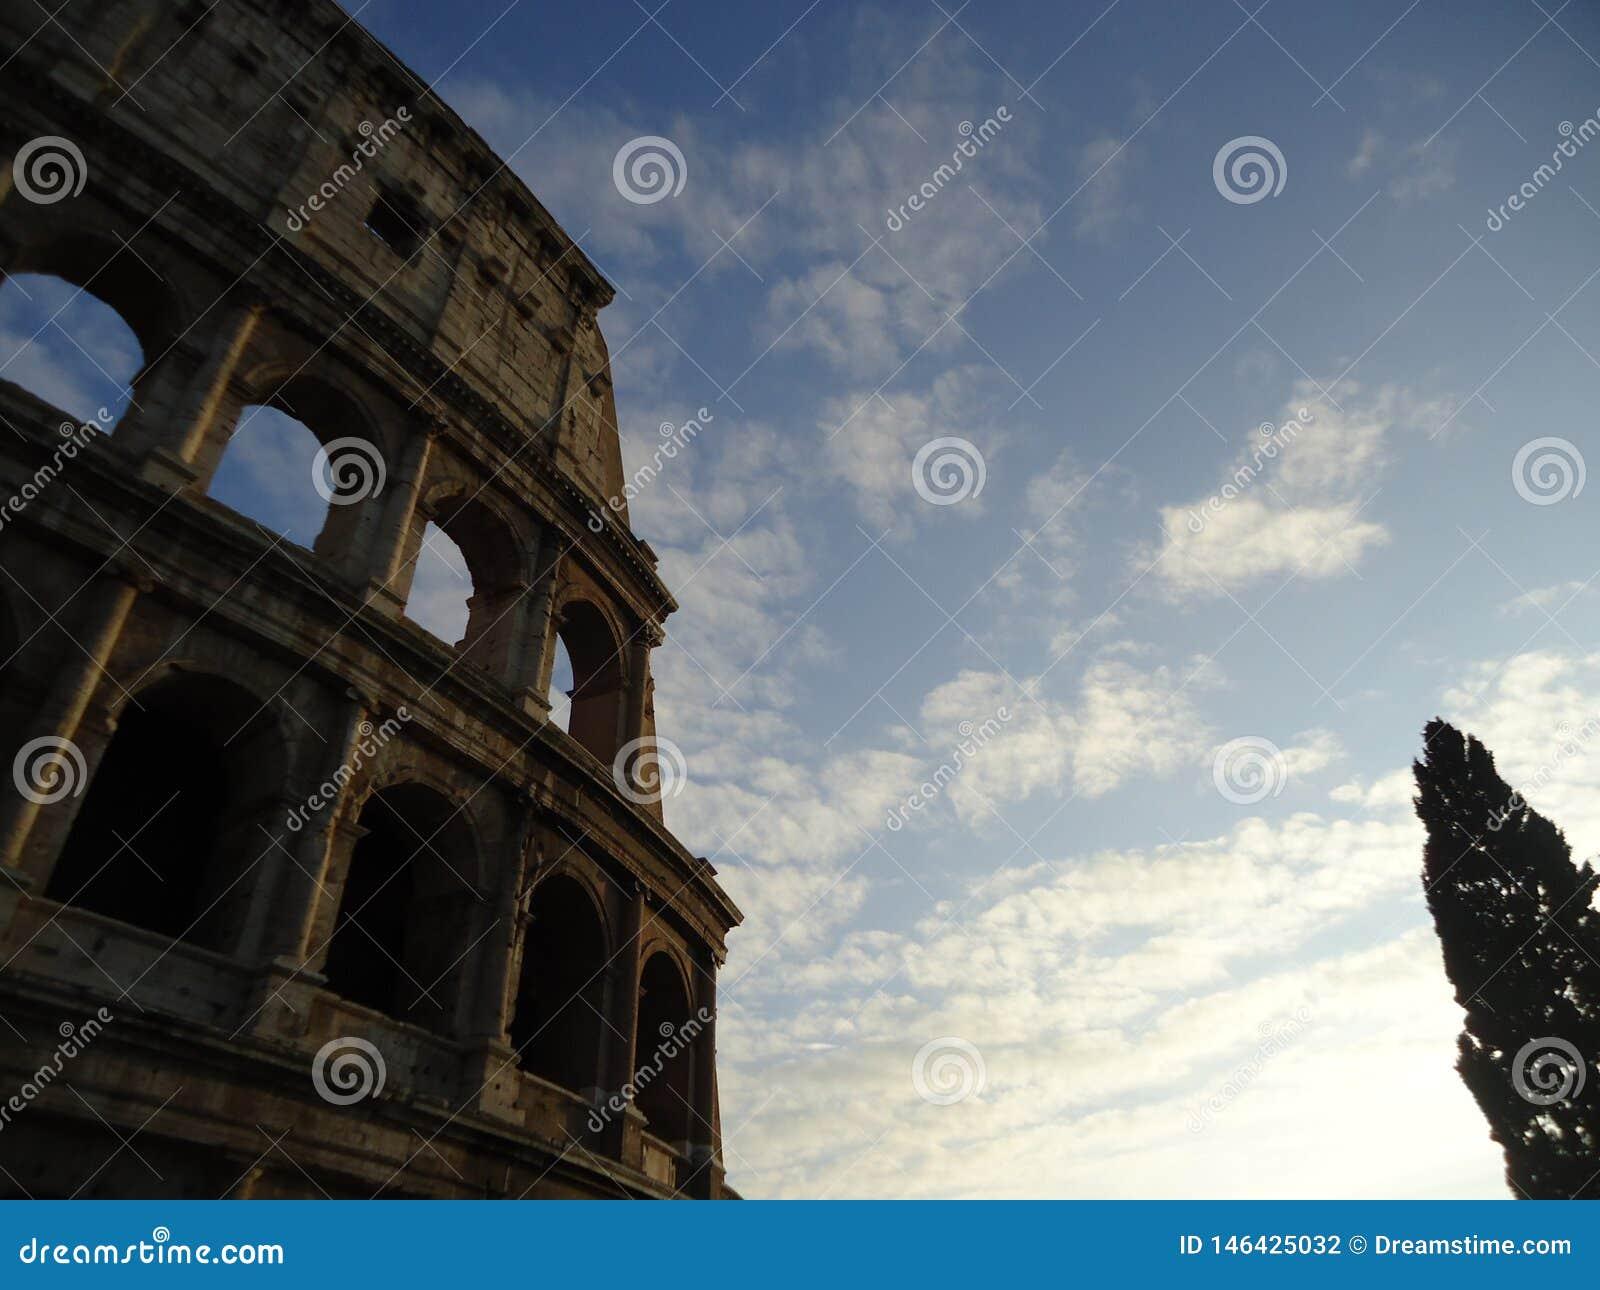 Roman colosseum with tree